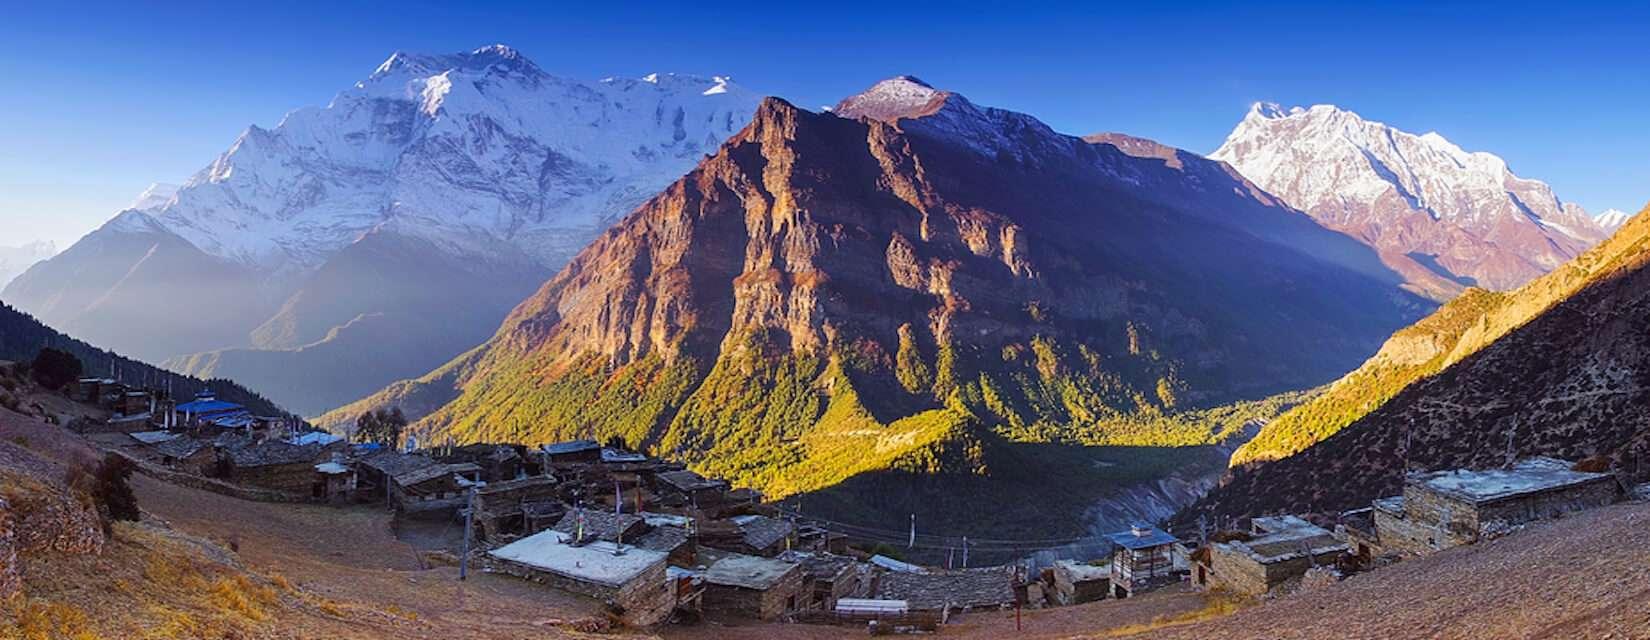 Cost for Annapurna Circuit Trek